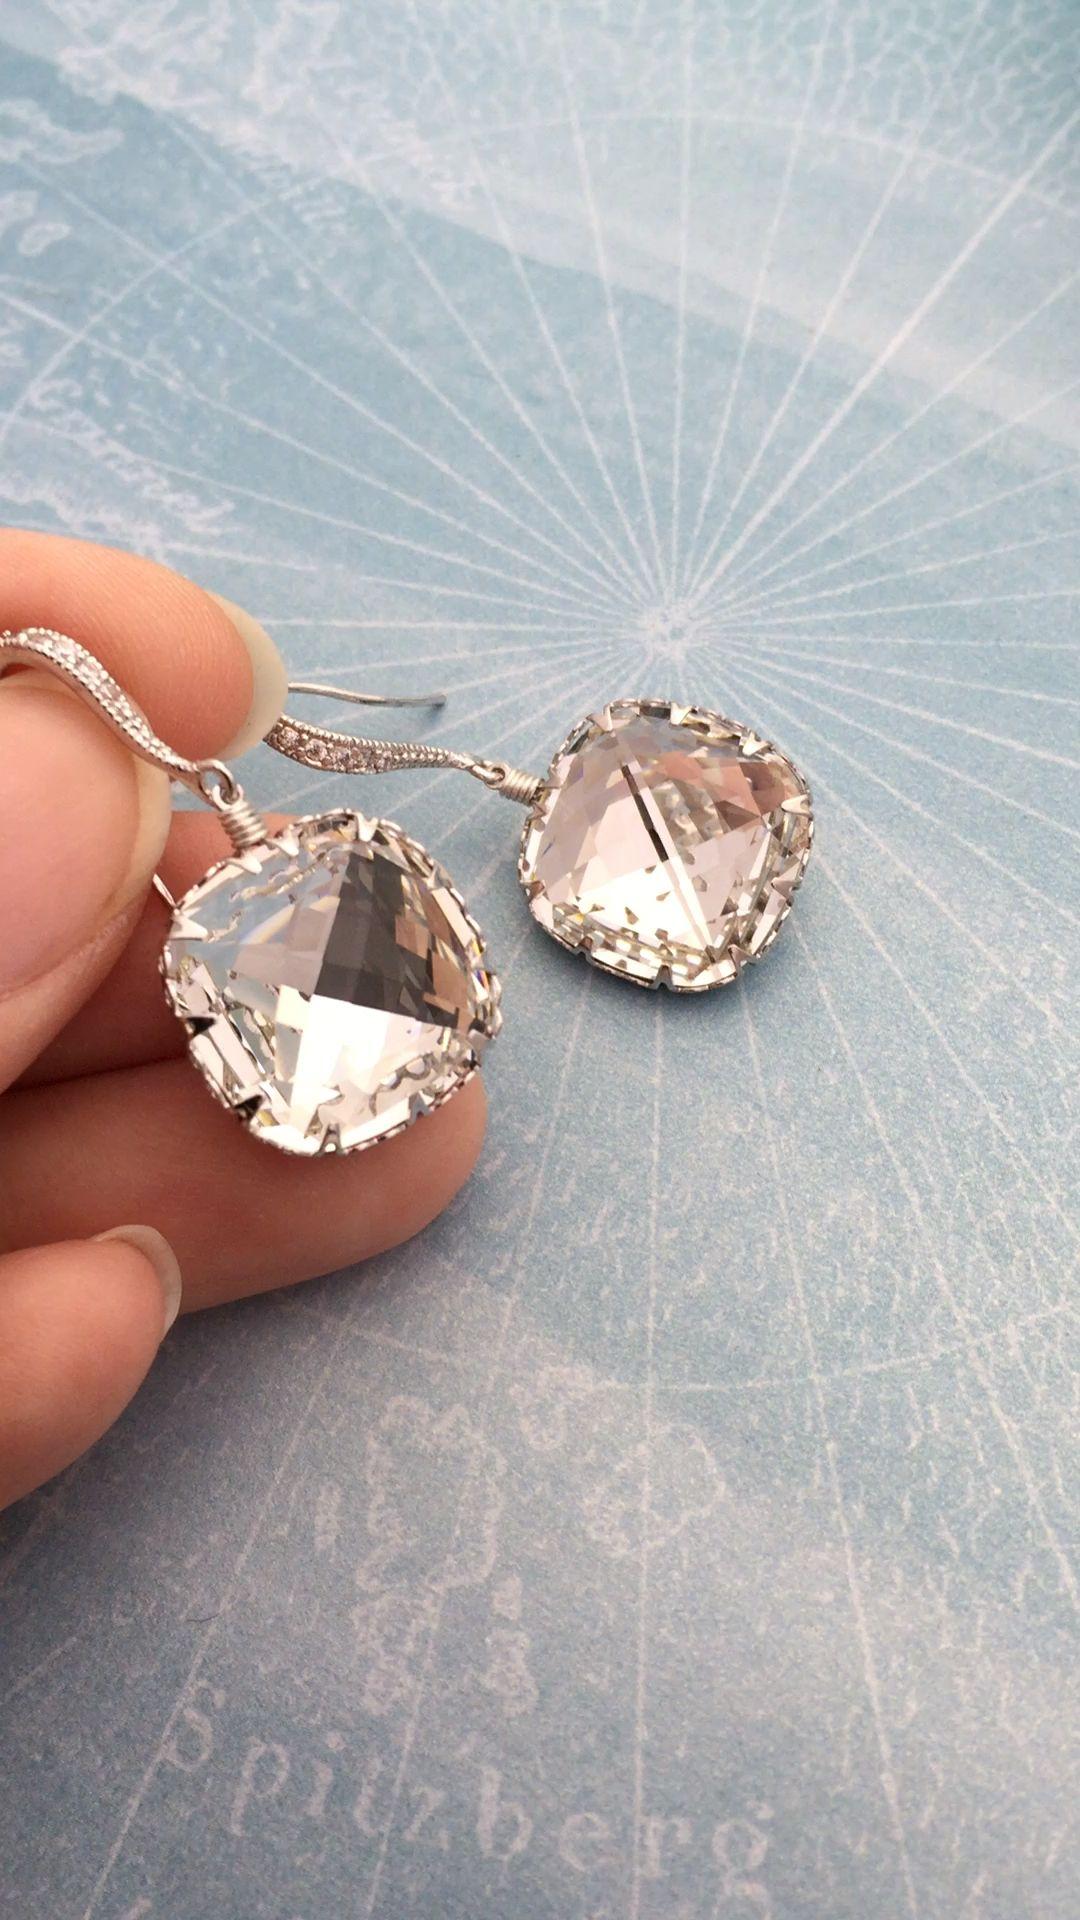 793ef6f05 Handmade Swarovski crystal earrings from EarringsNation bridal earrings  cushion cut earrings elegant earrings statement earrings